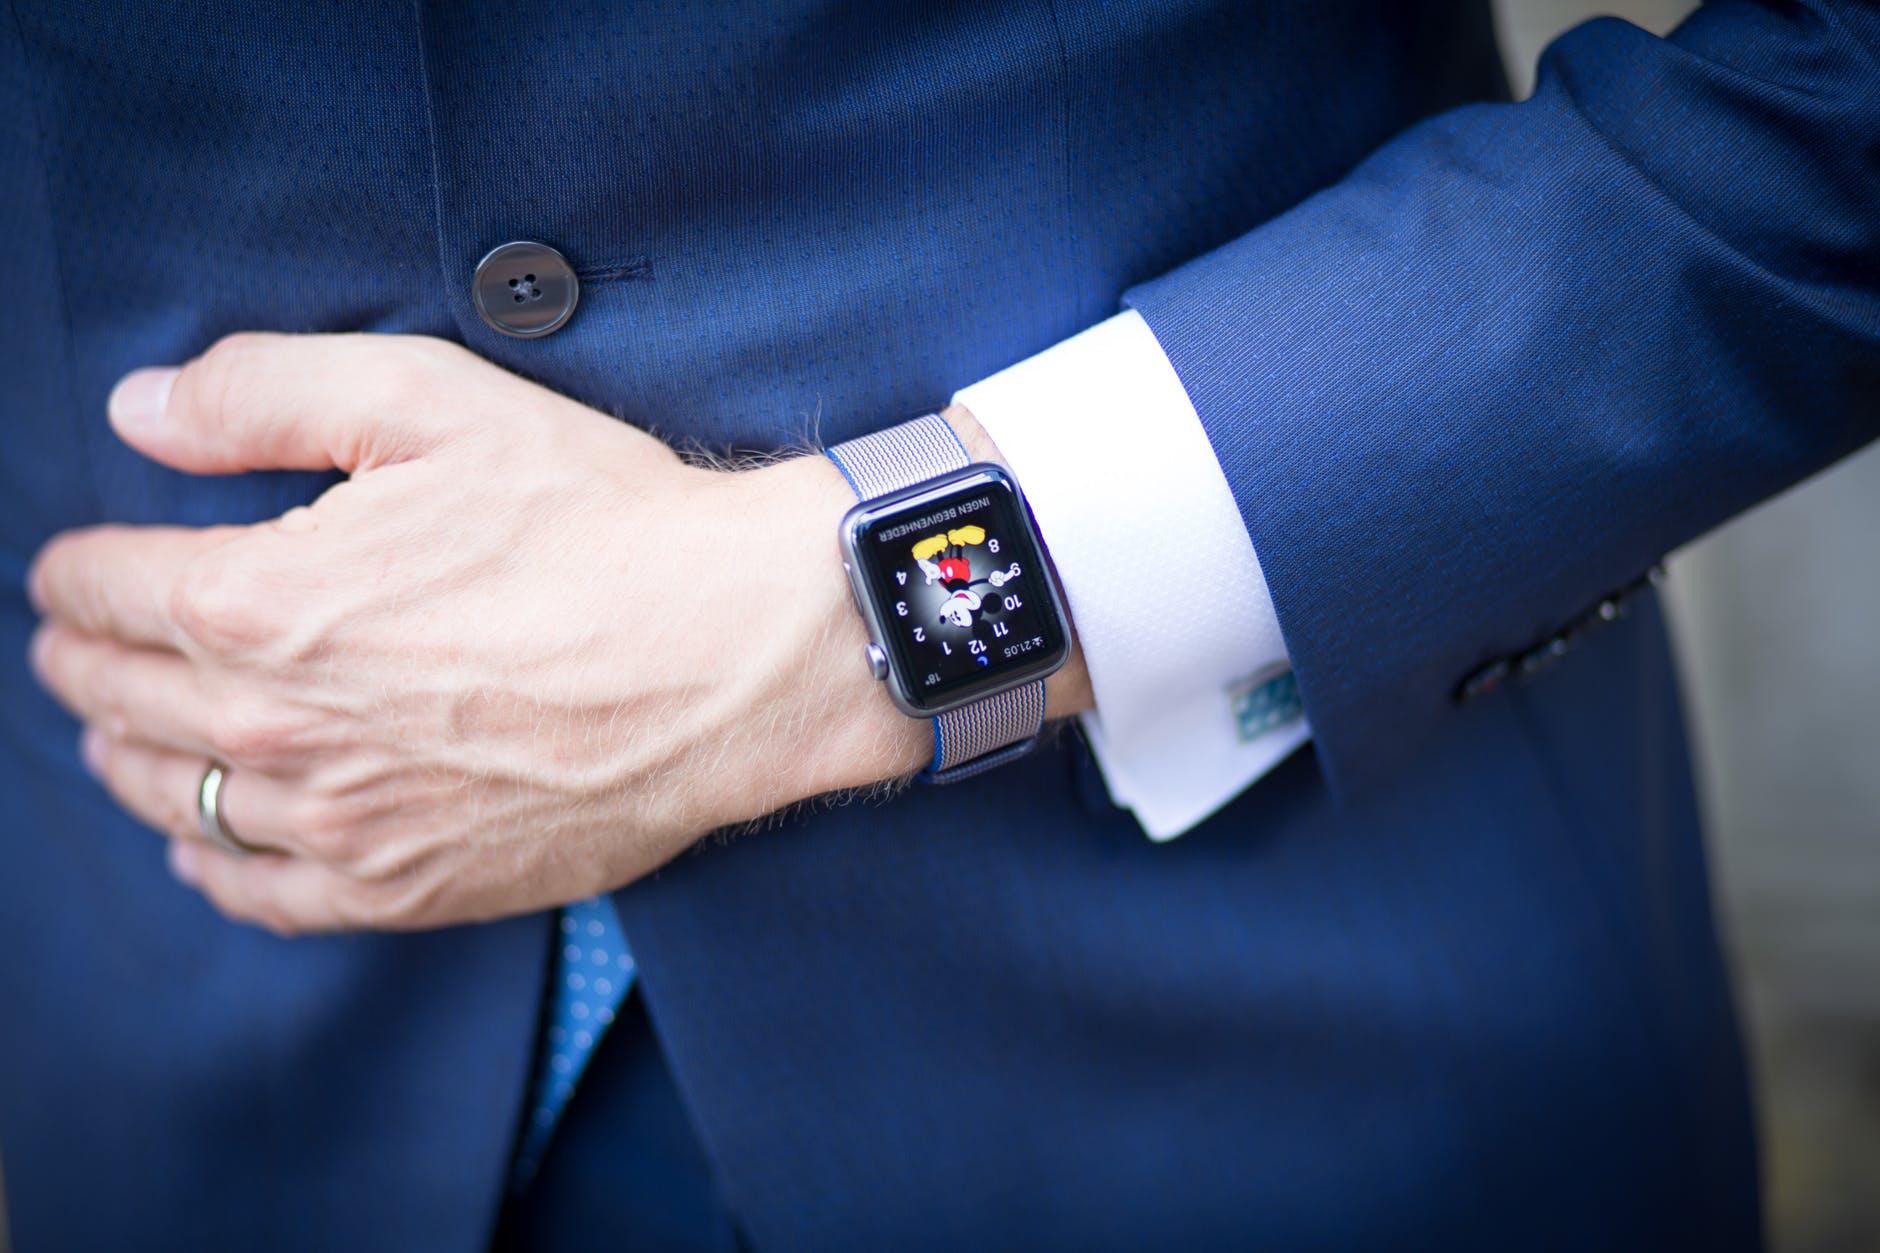 Vantagens de ter um Smartwatch